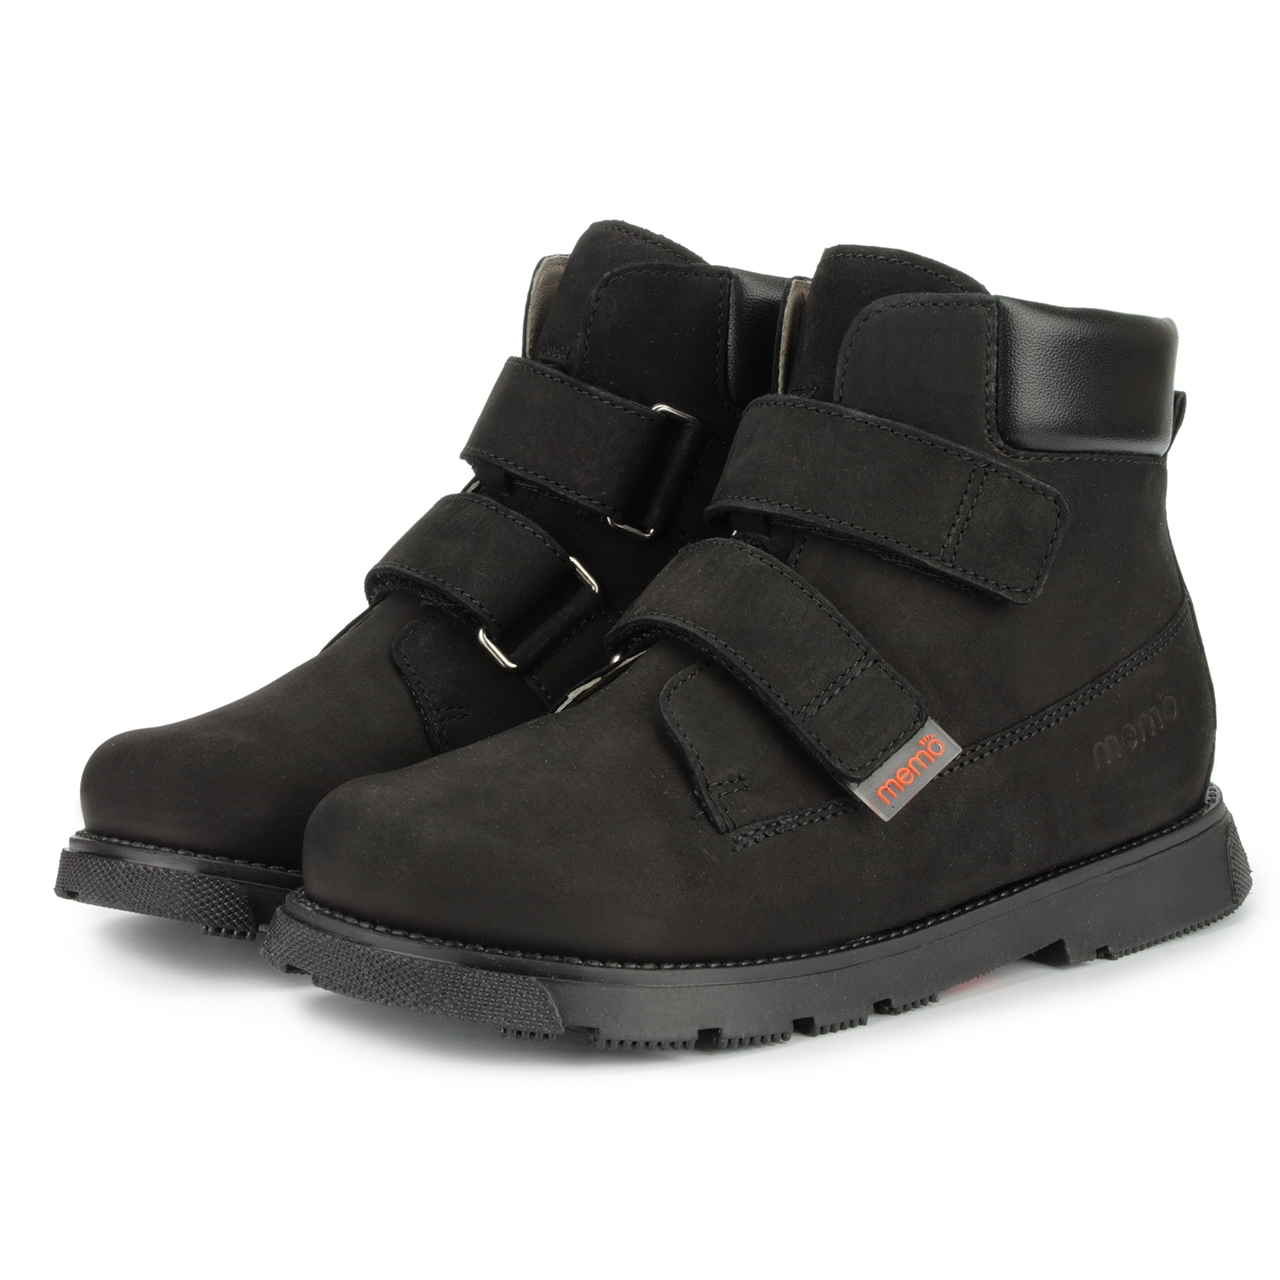 Memo Shoes Memo Malmo Black Corrective Orthopedic Ankle